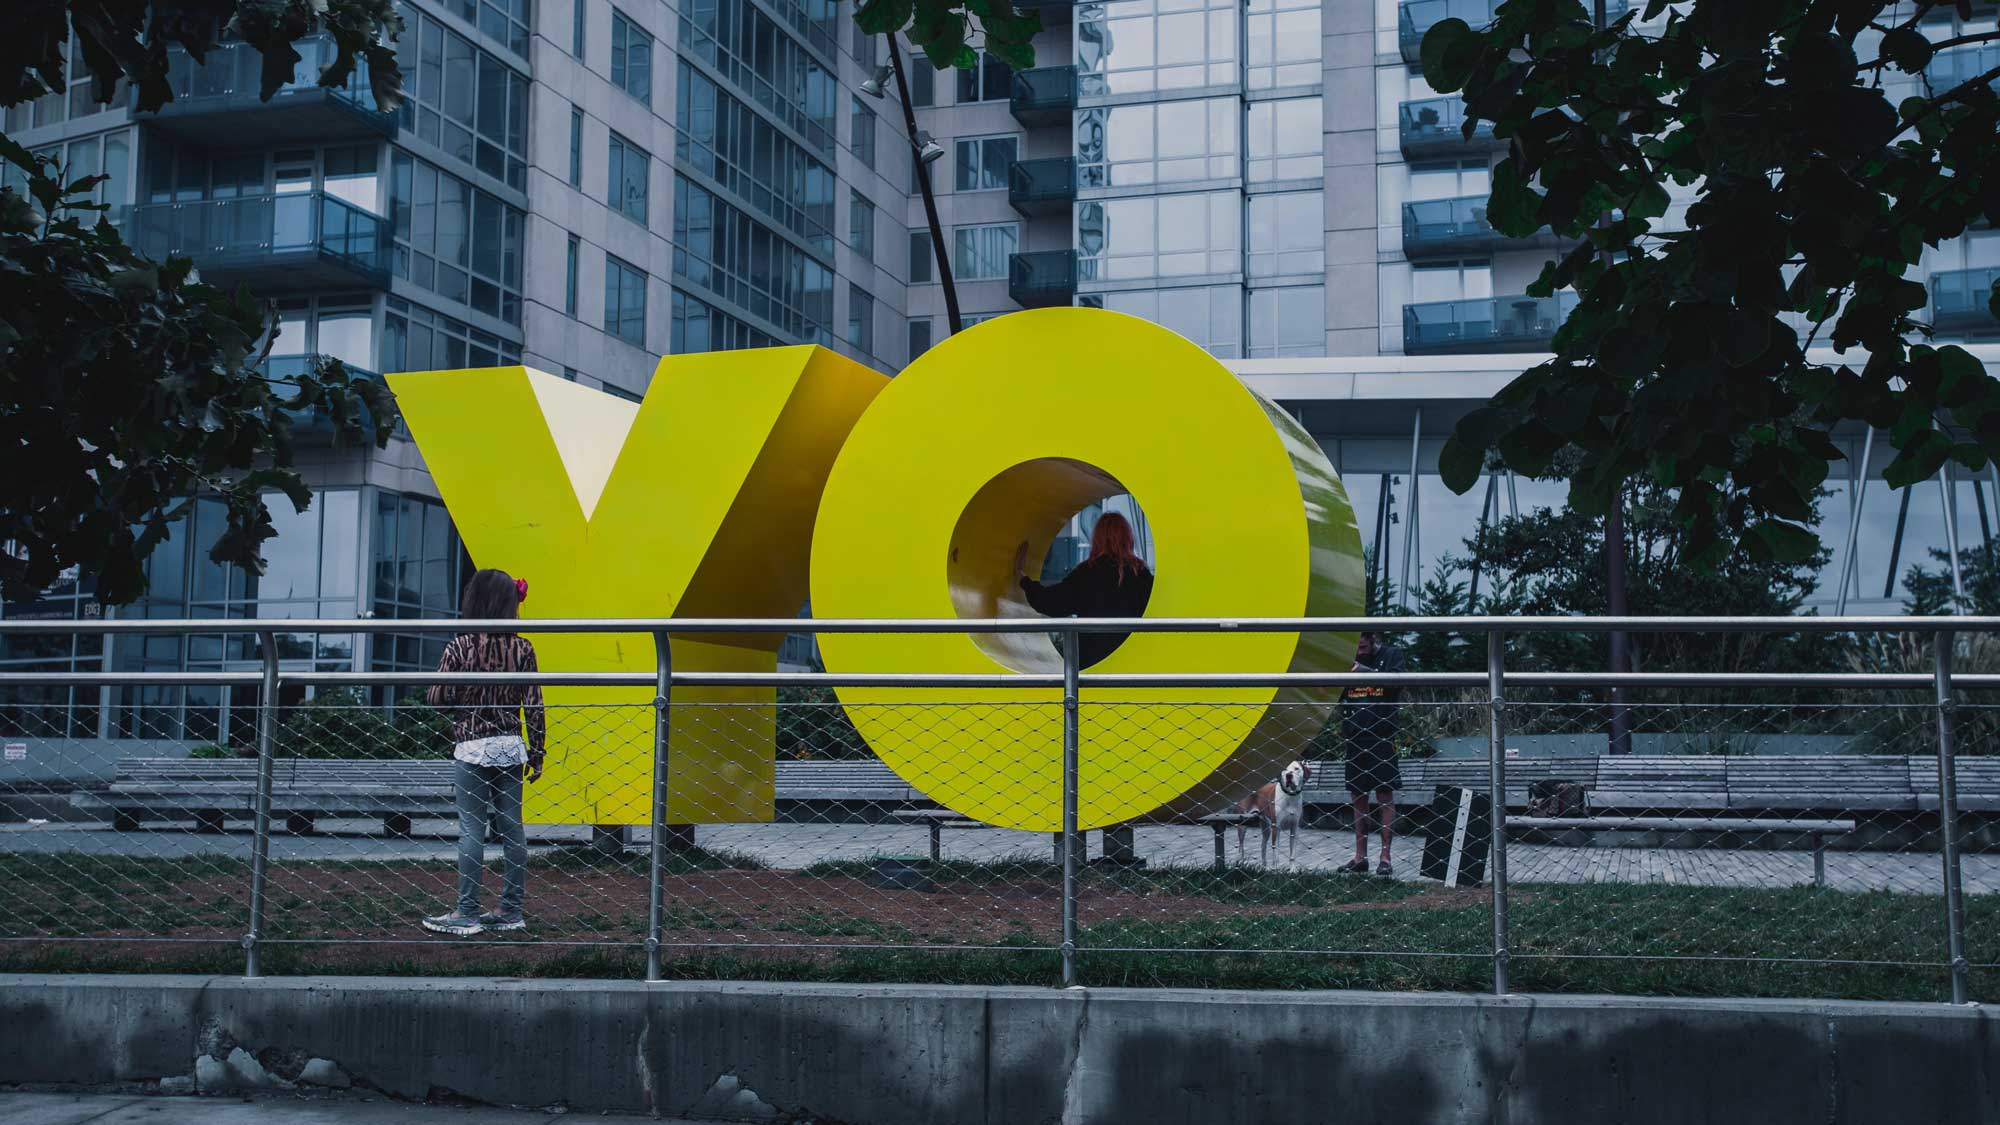 Yo sculpture, Photo byJp ValeryonUnsplash